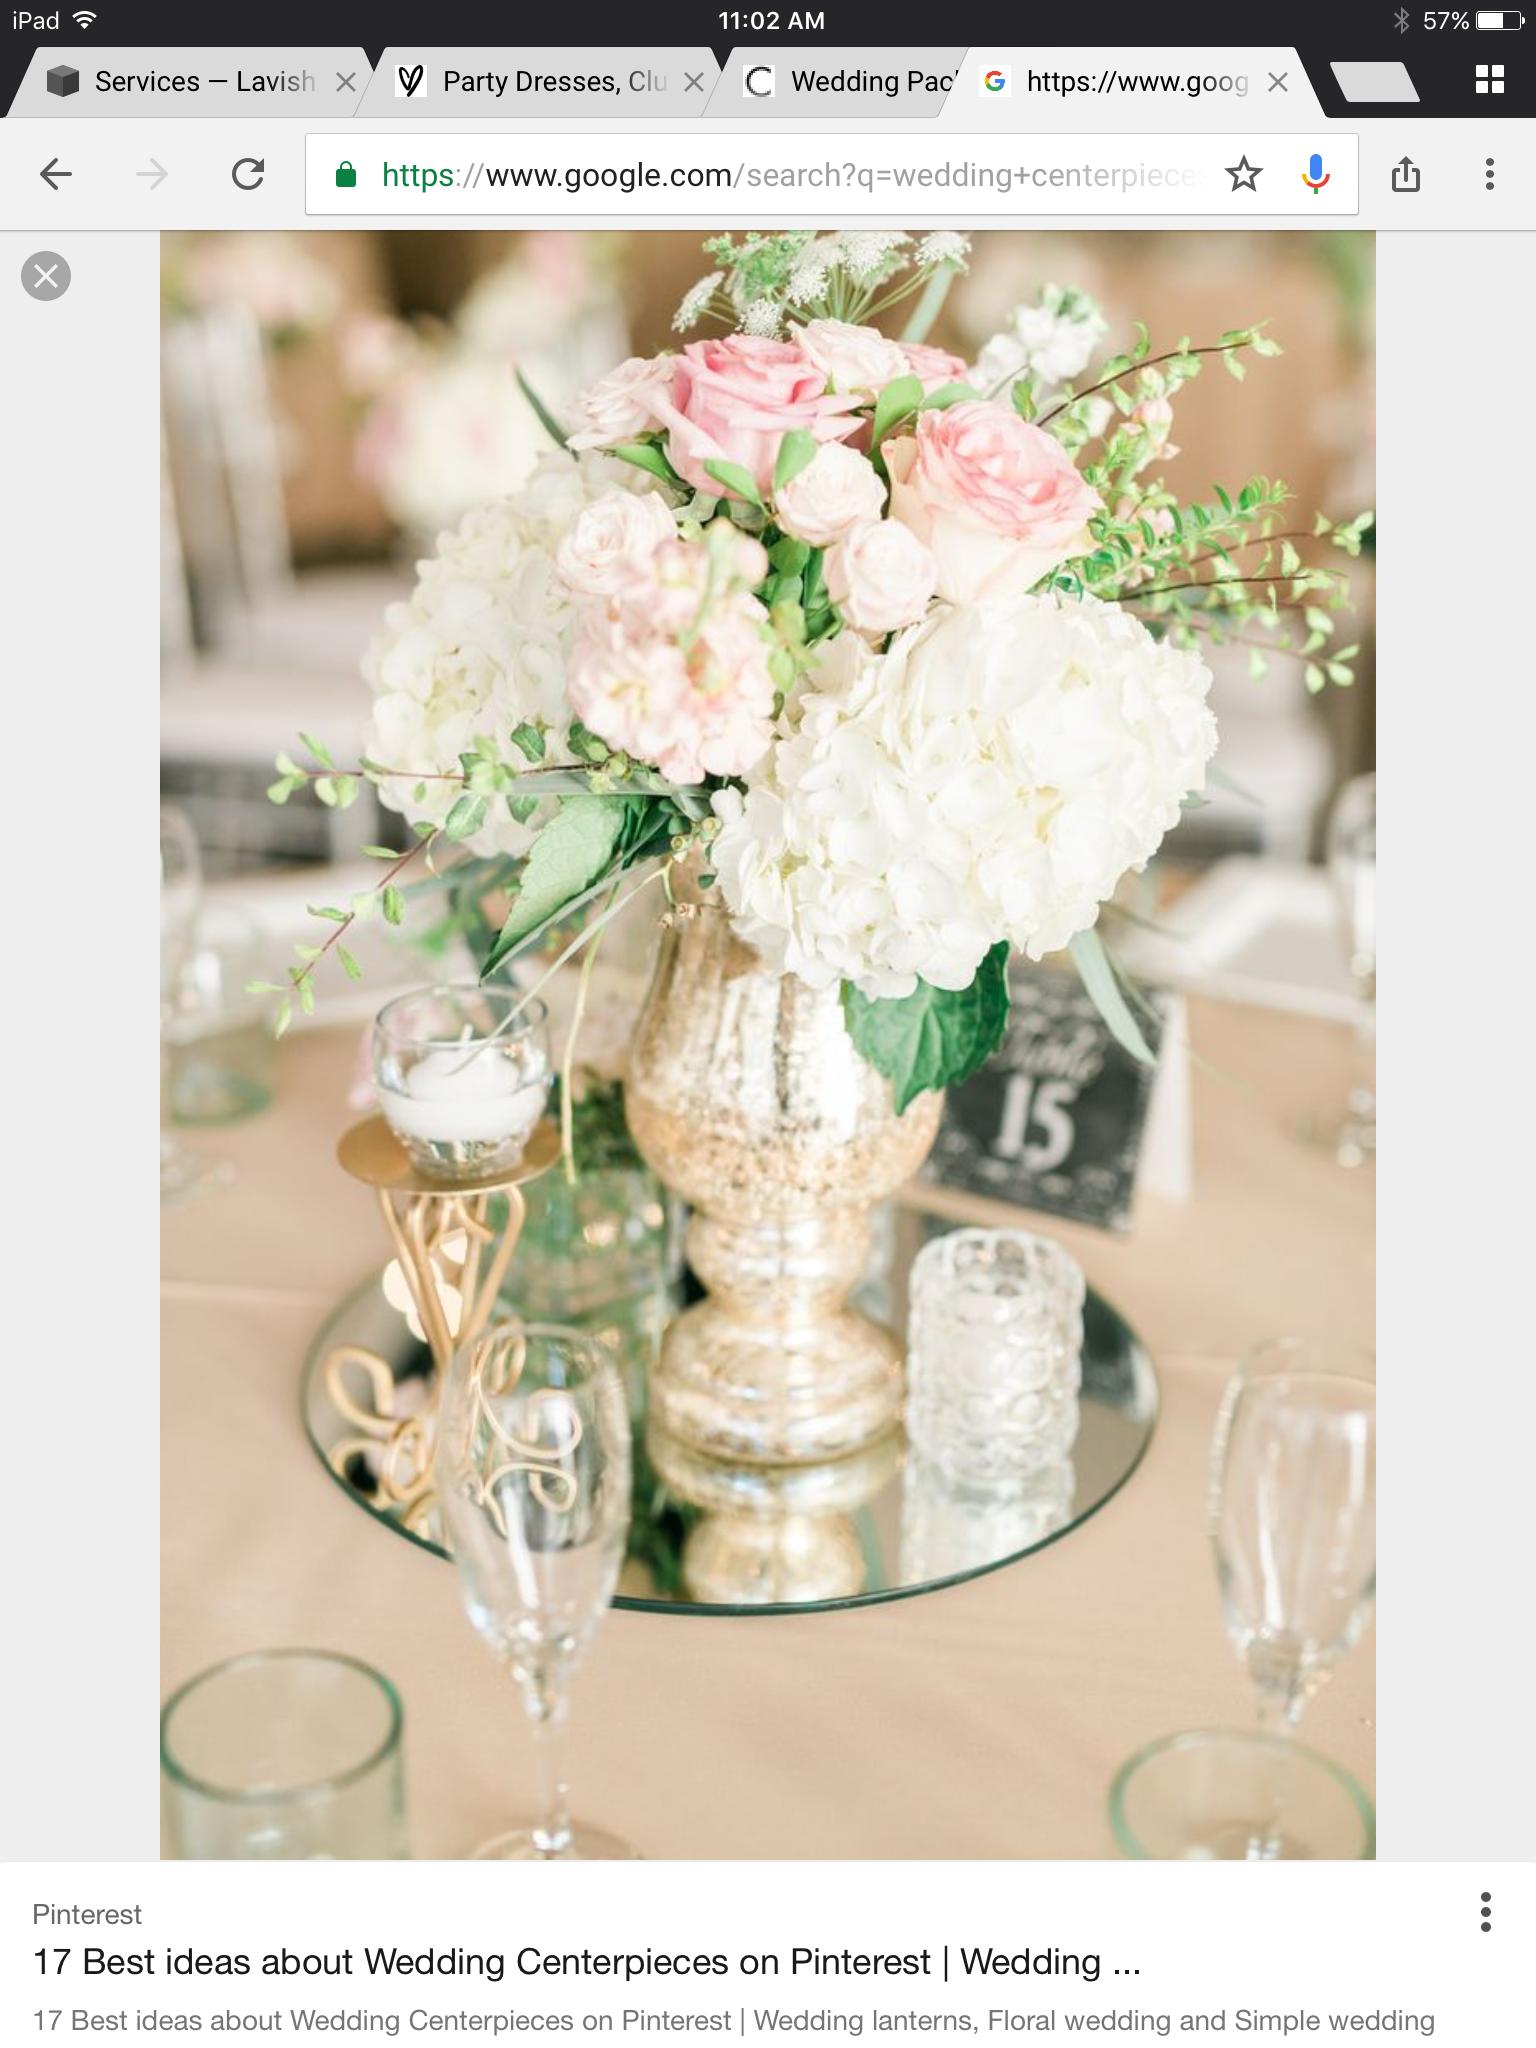 Pin by Jordyn Toone on Wedding Centerpieces | Pinterest | Wedding ...